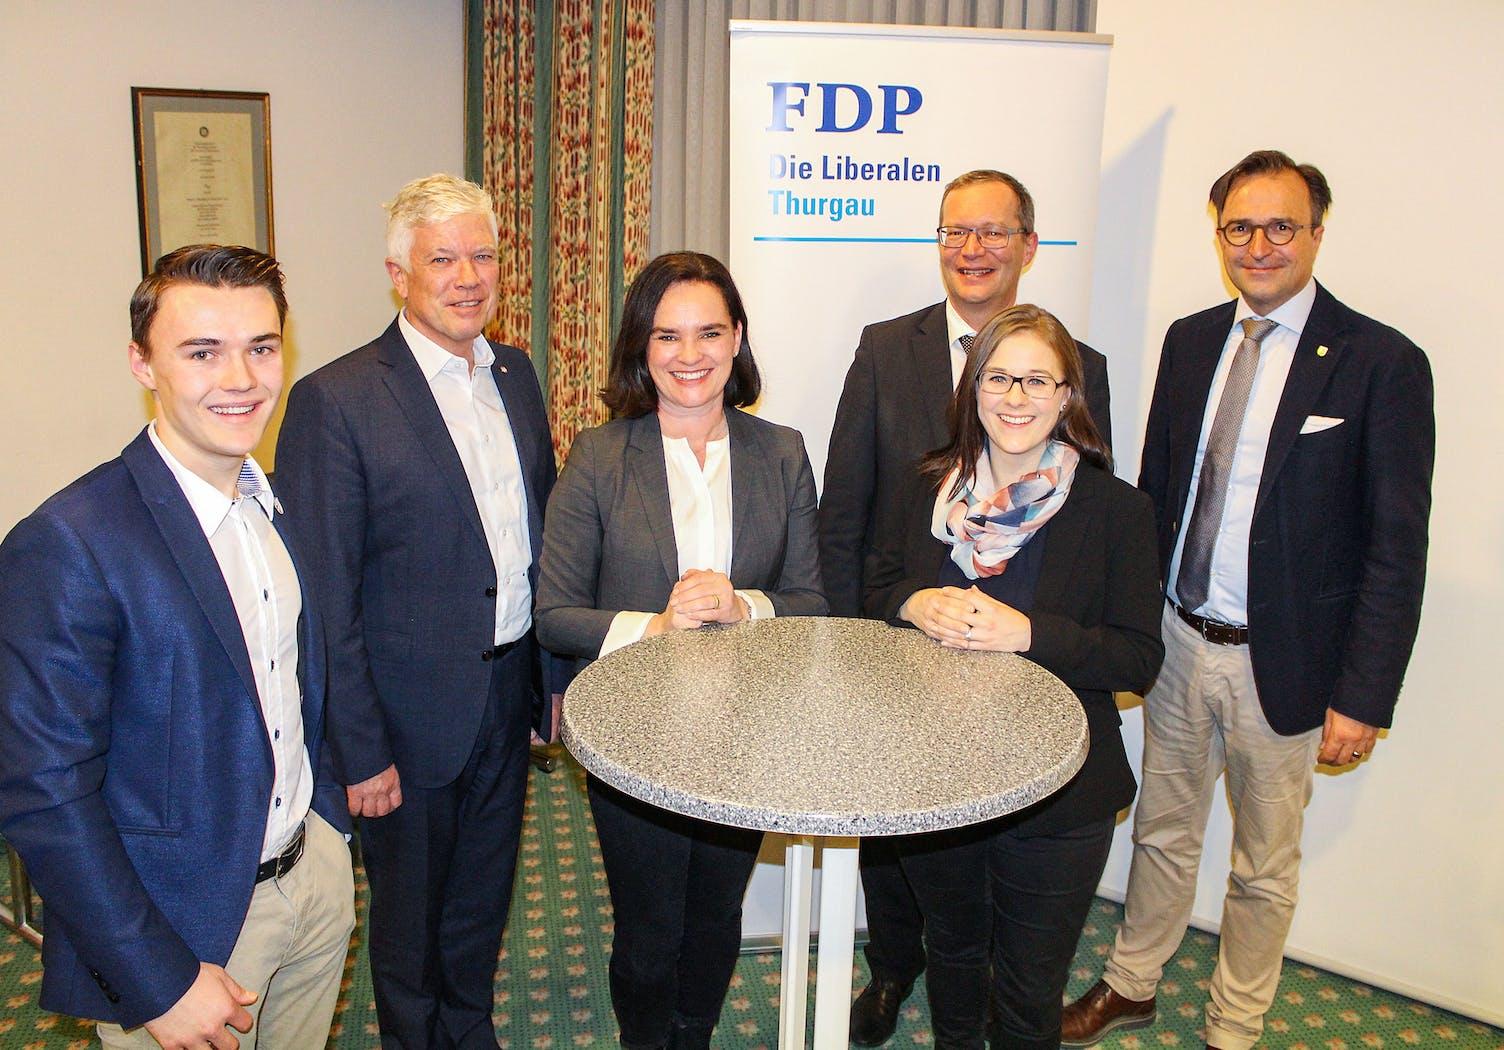 FDP Thurgau